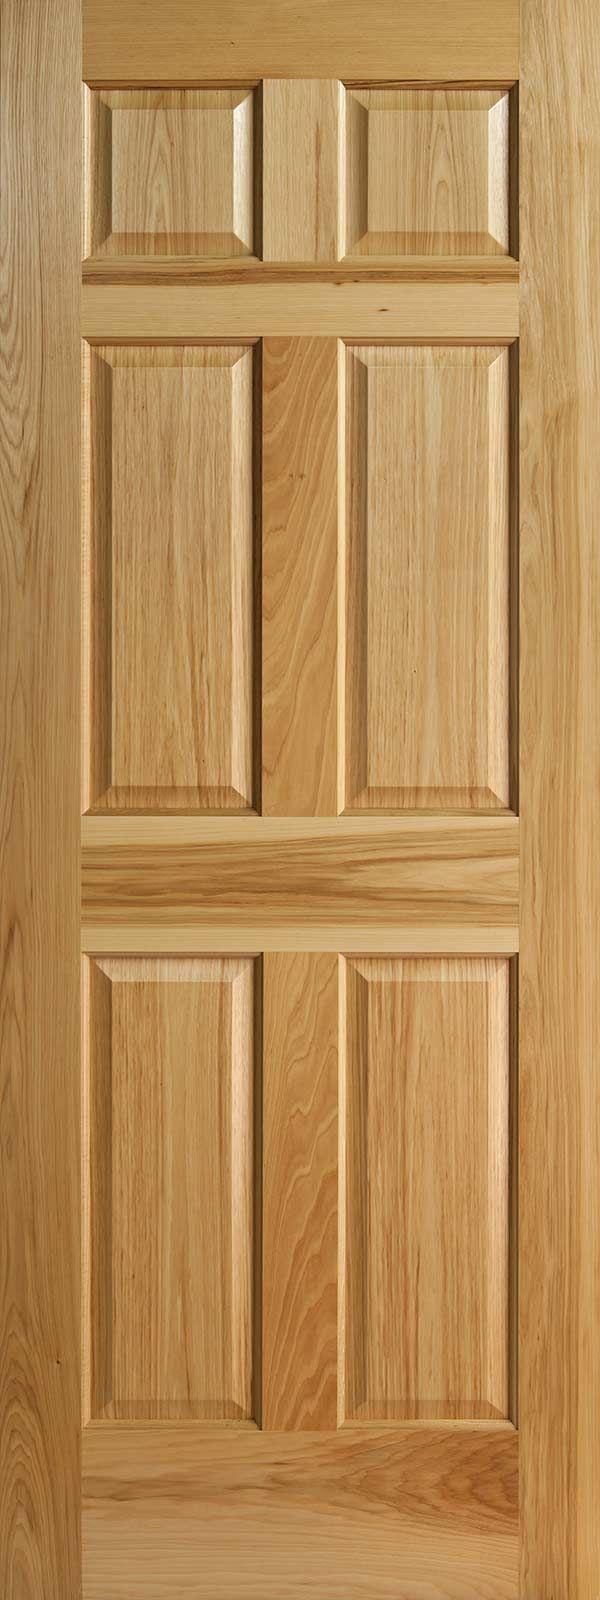 best 25+ raised panel doors ideas on pinterest | diy 4 panel doors